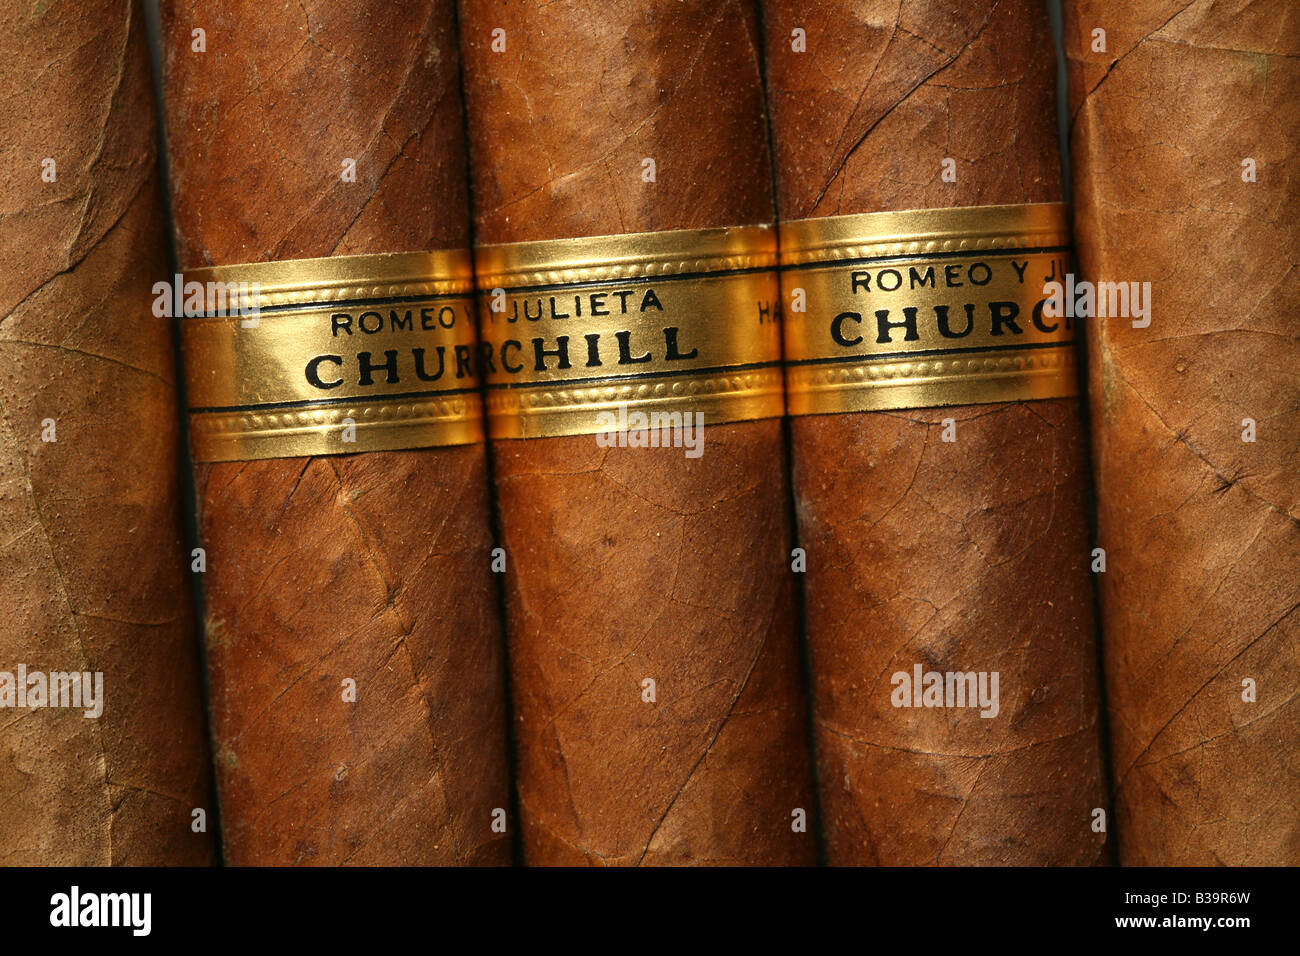 Berühmten kubanischen Zigarren-Romeo y Julieta (Romeo und Julia) Churchill-Größe Stockbild